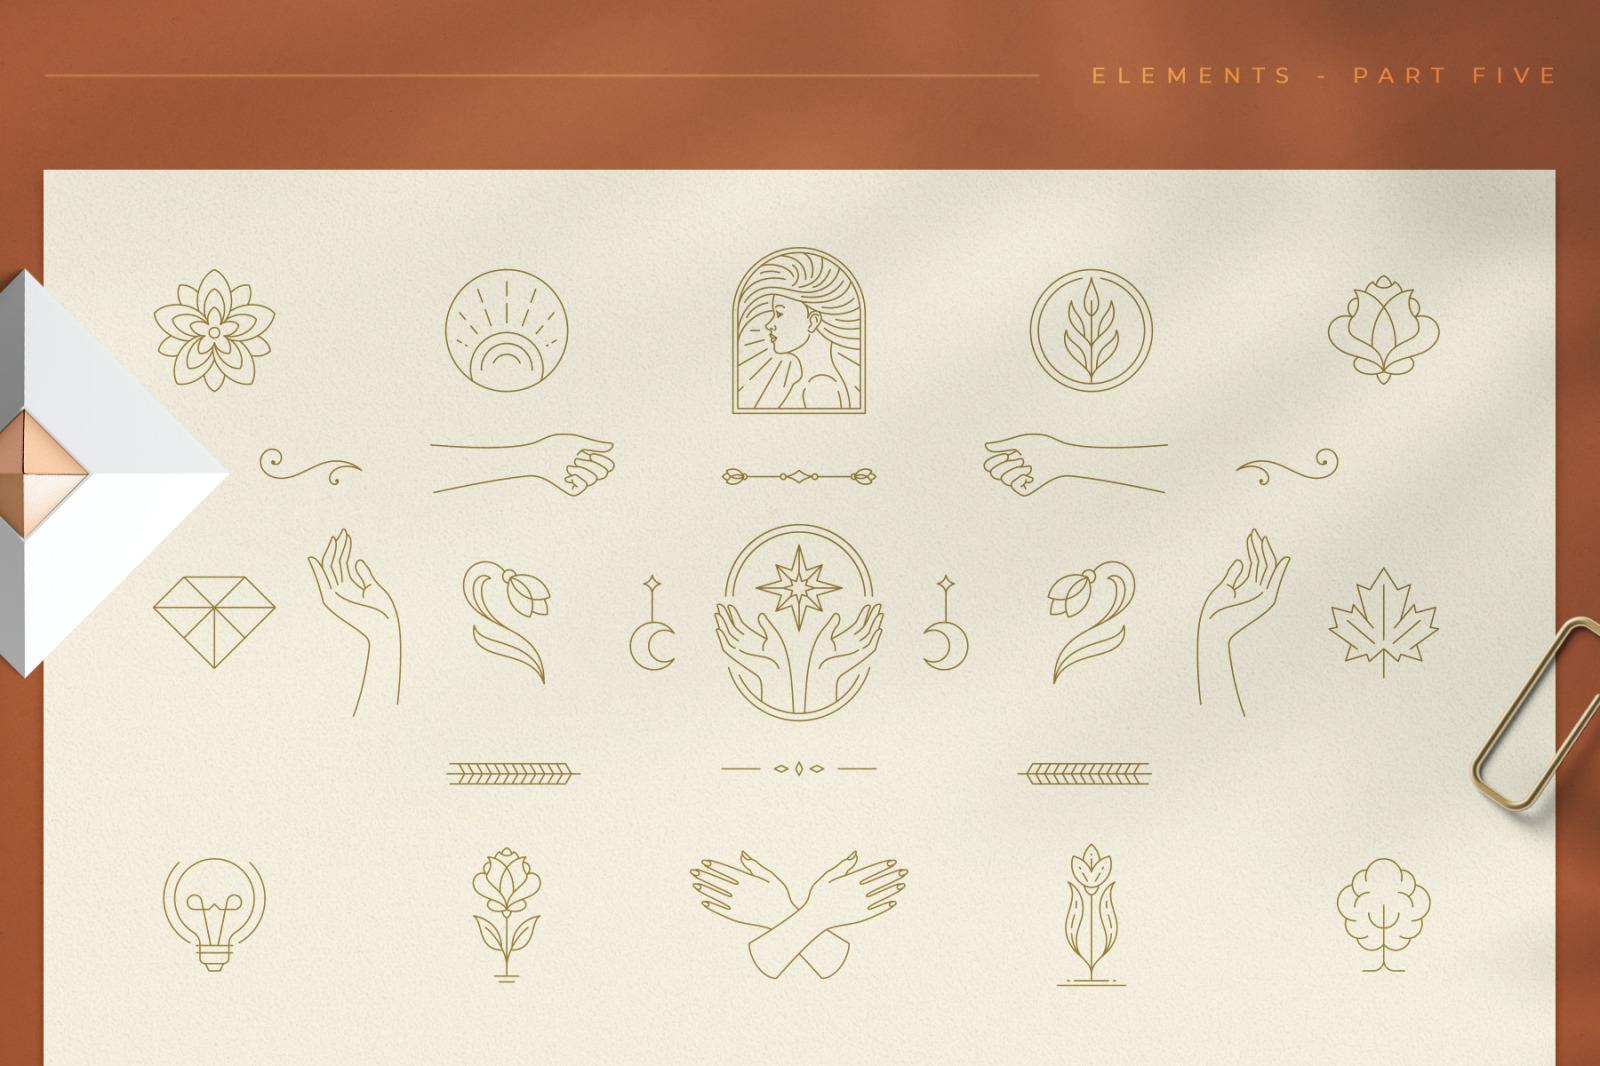 Logo Line Elements Collection